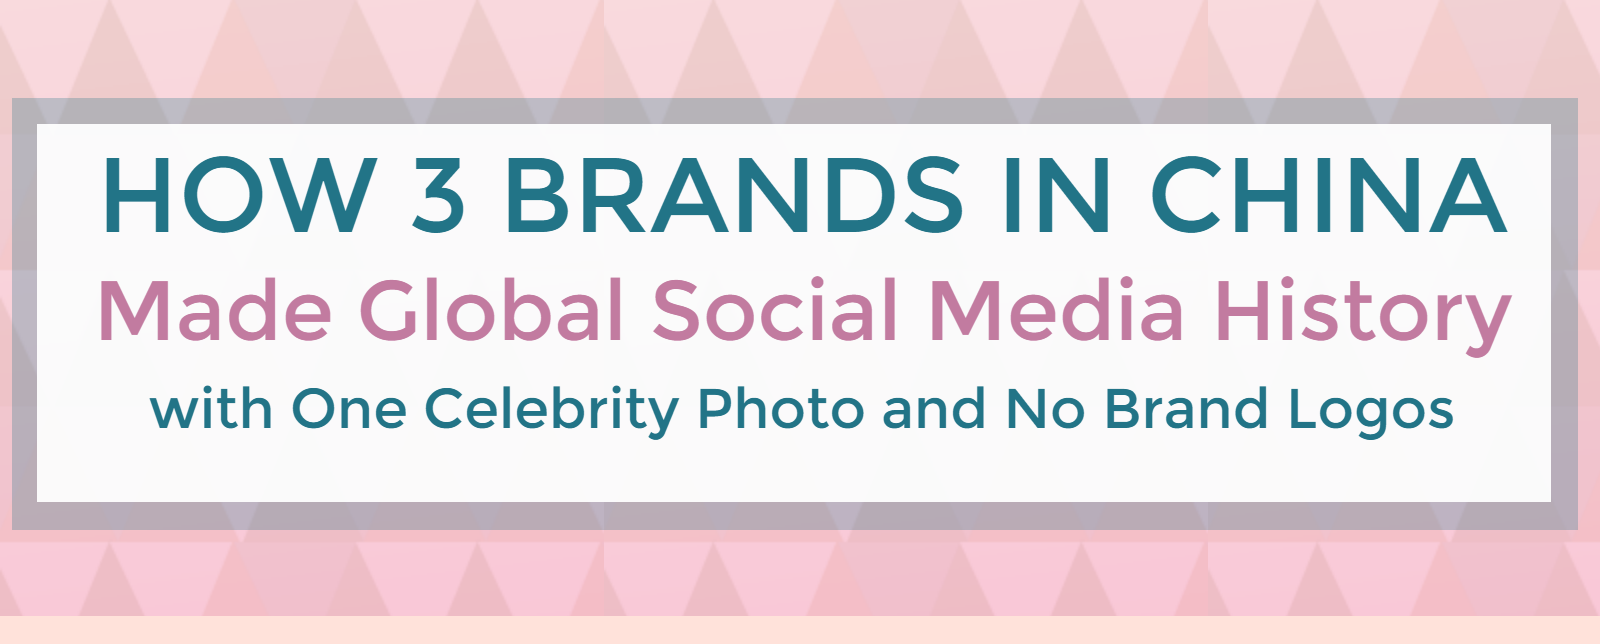 how-3-brands-made-social-media-history-bingbing-us_1435649226517_block_0